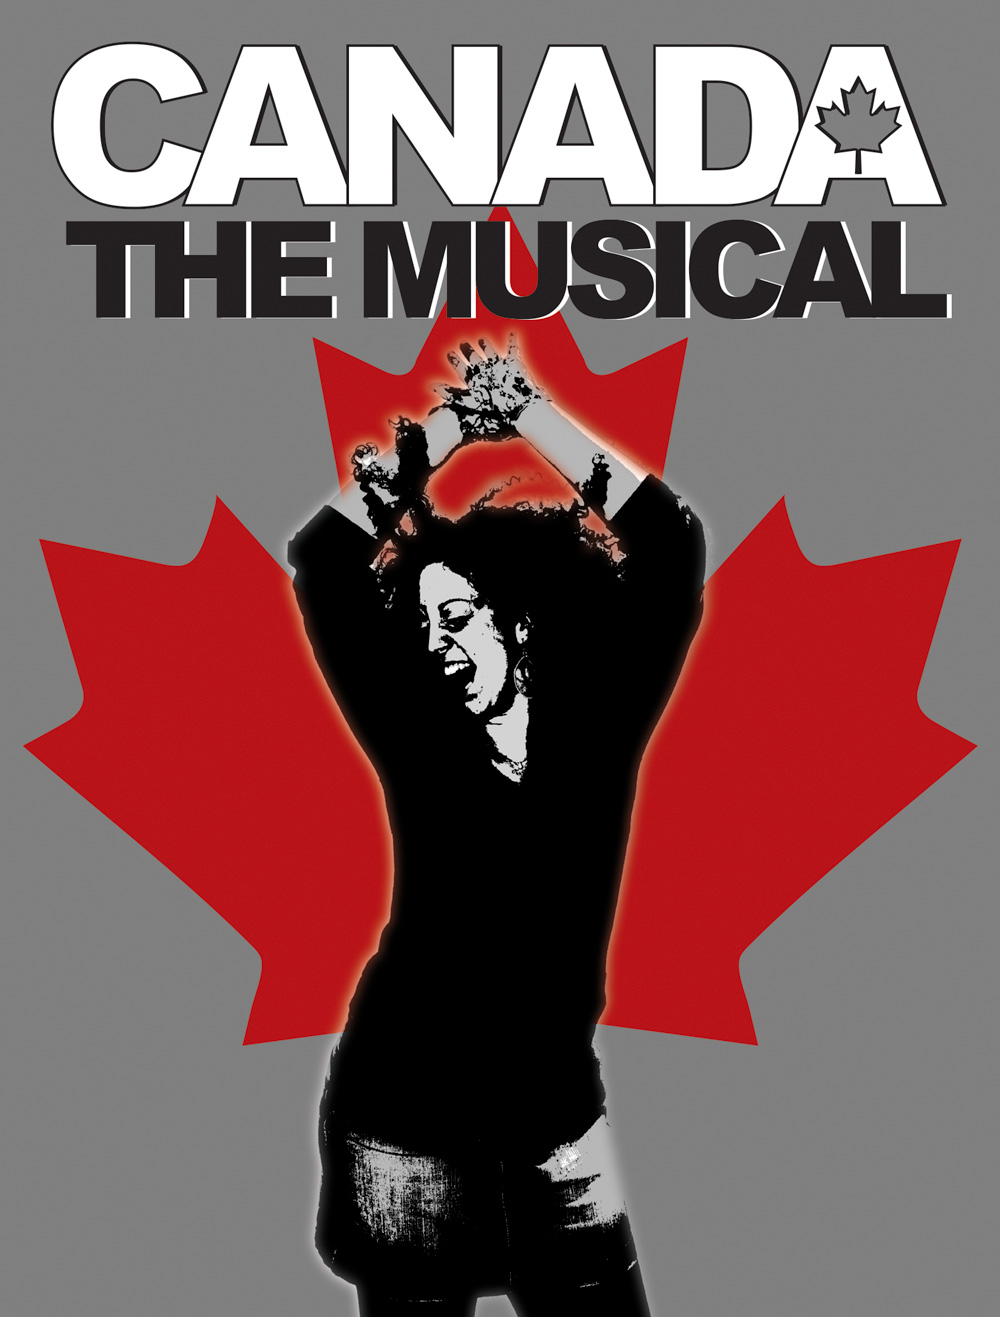 canada-the-musical-vertical2.jpg